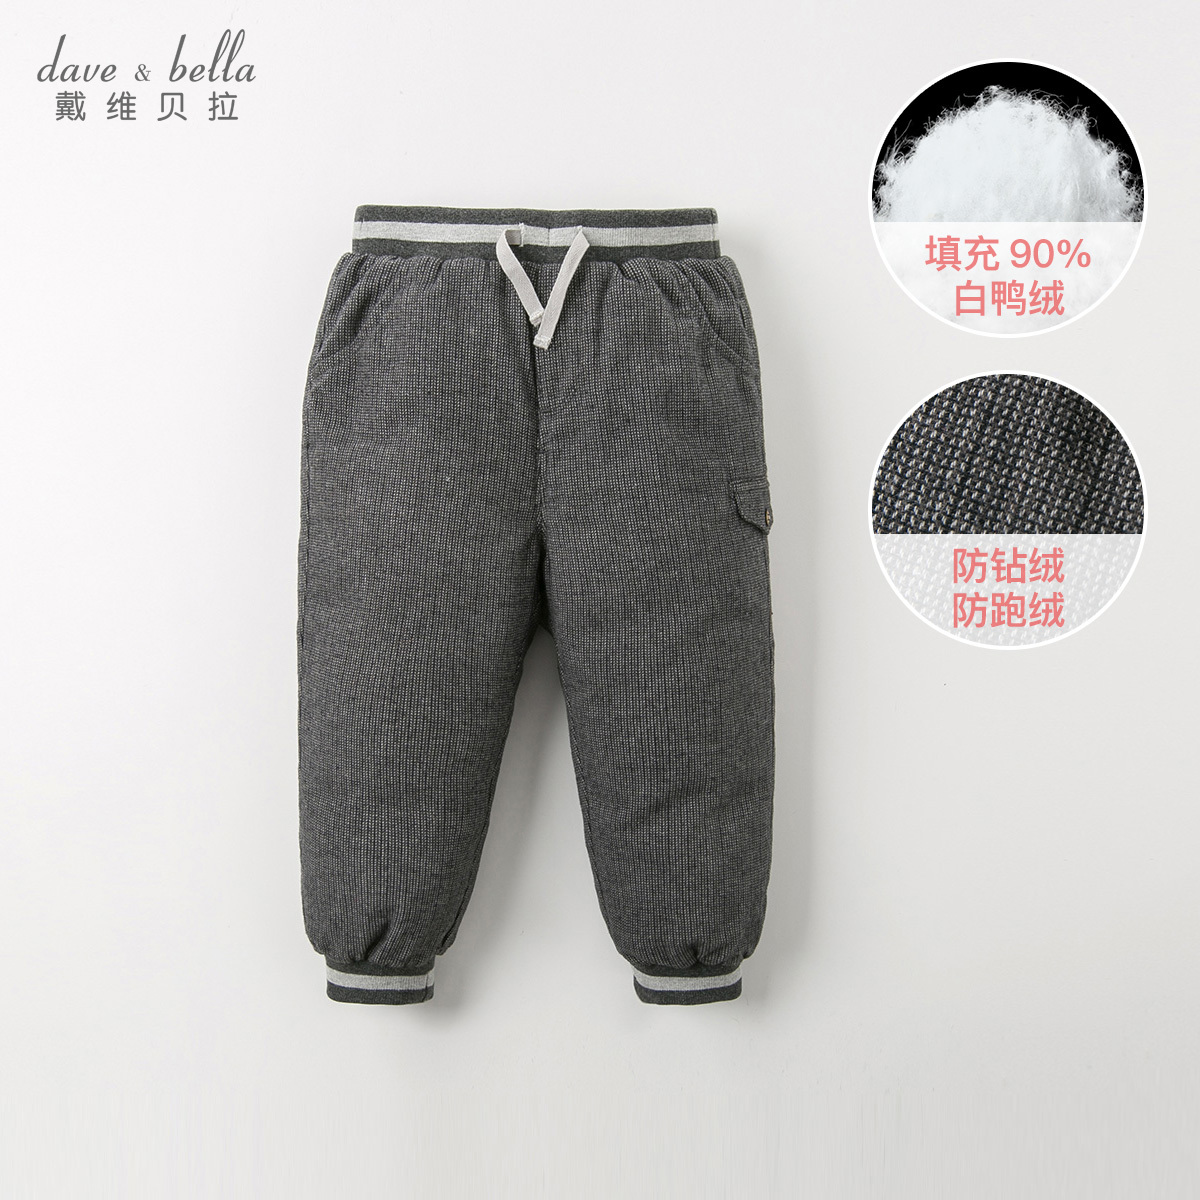 davebella戴维贝拉冬季白鸭绒男童羽绒裤宝宝儿童加厚裤子外穿